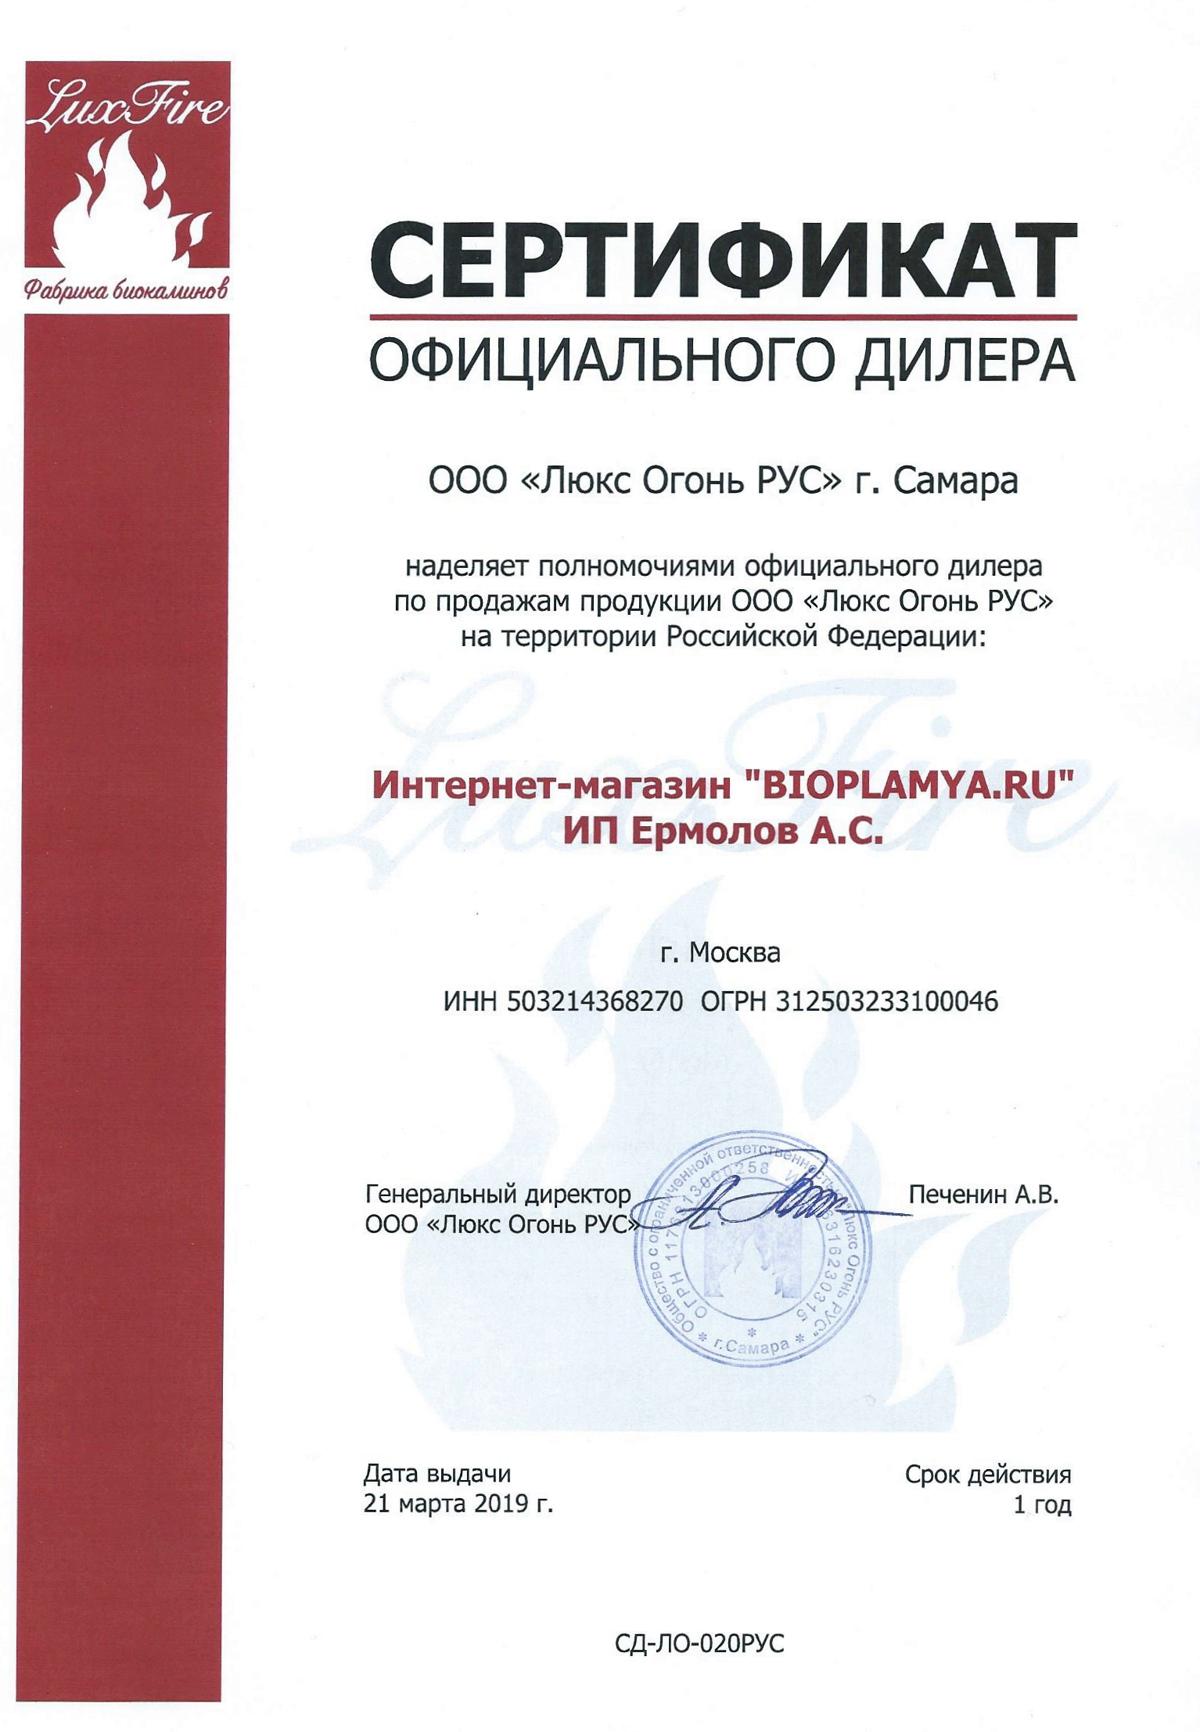 Сертификат-дилера-LuxFire.jpeg